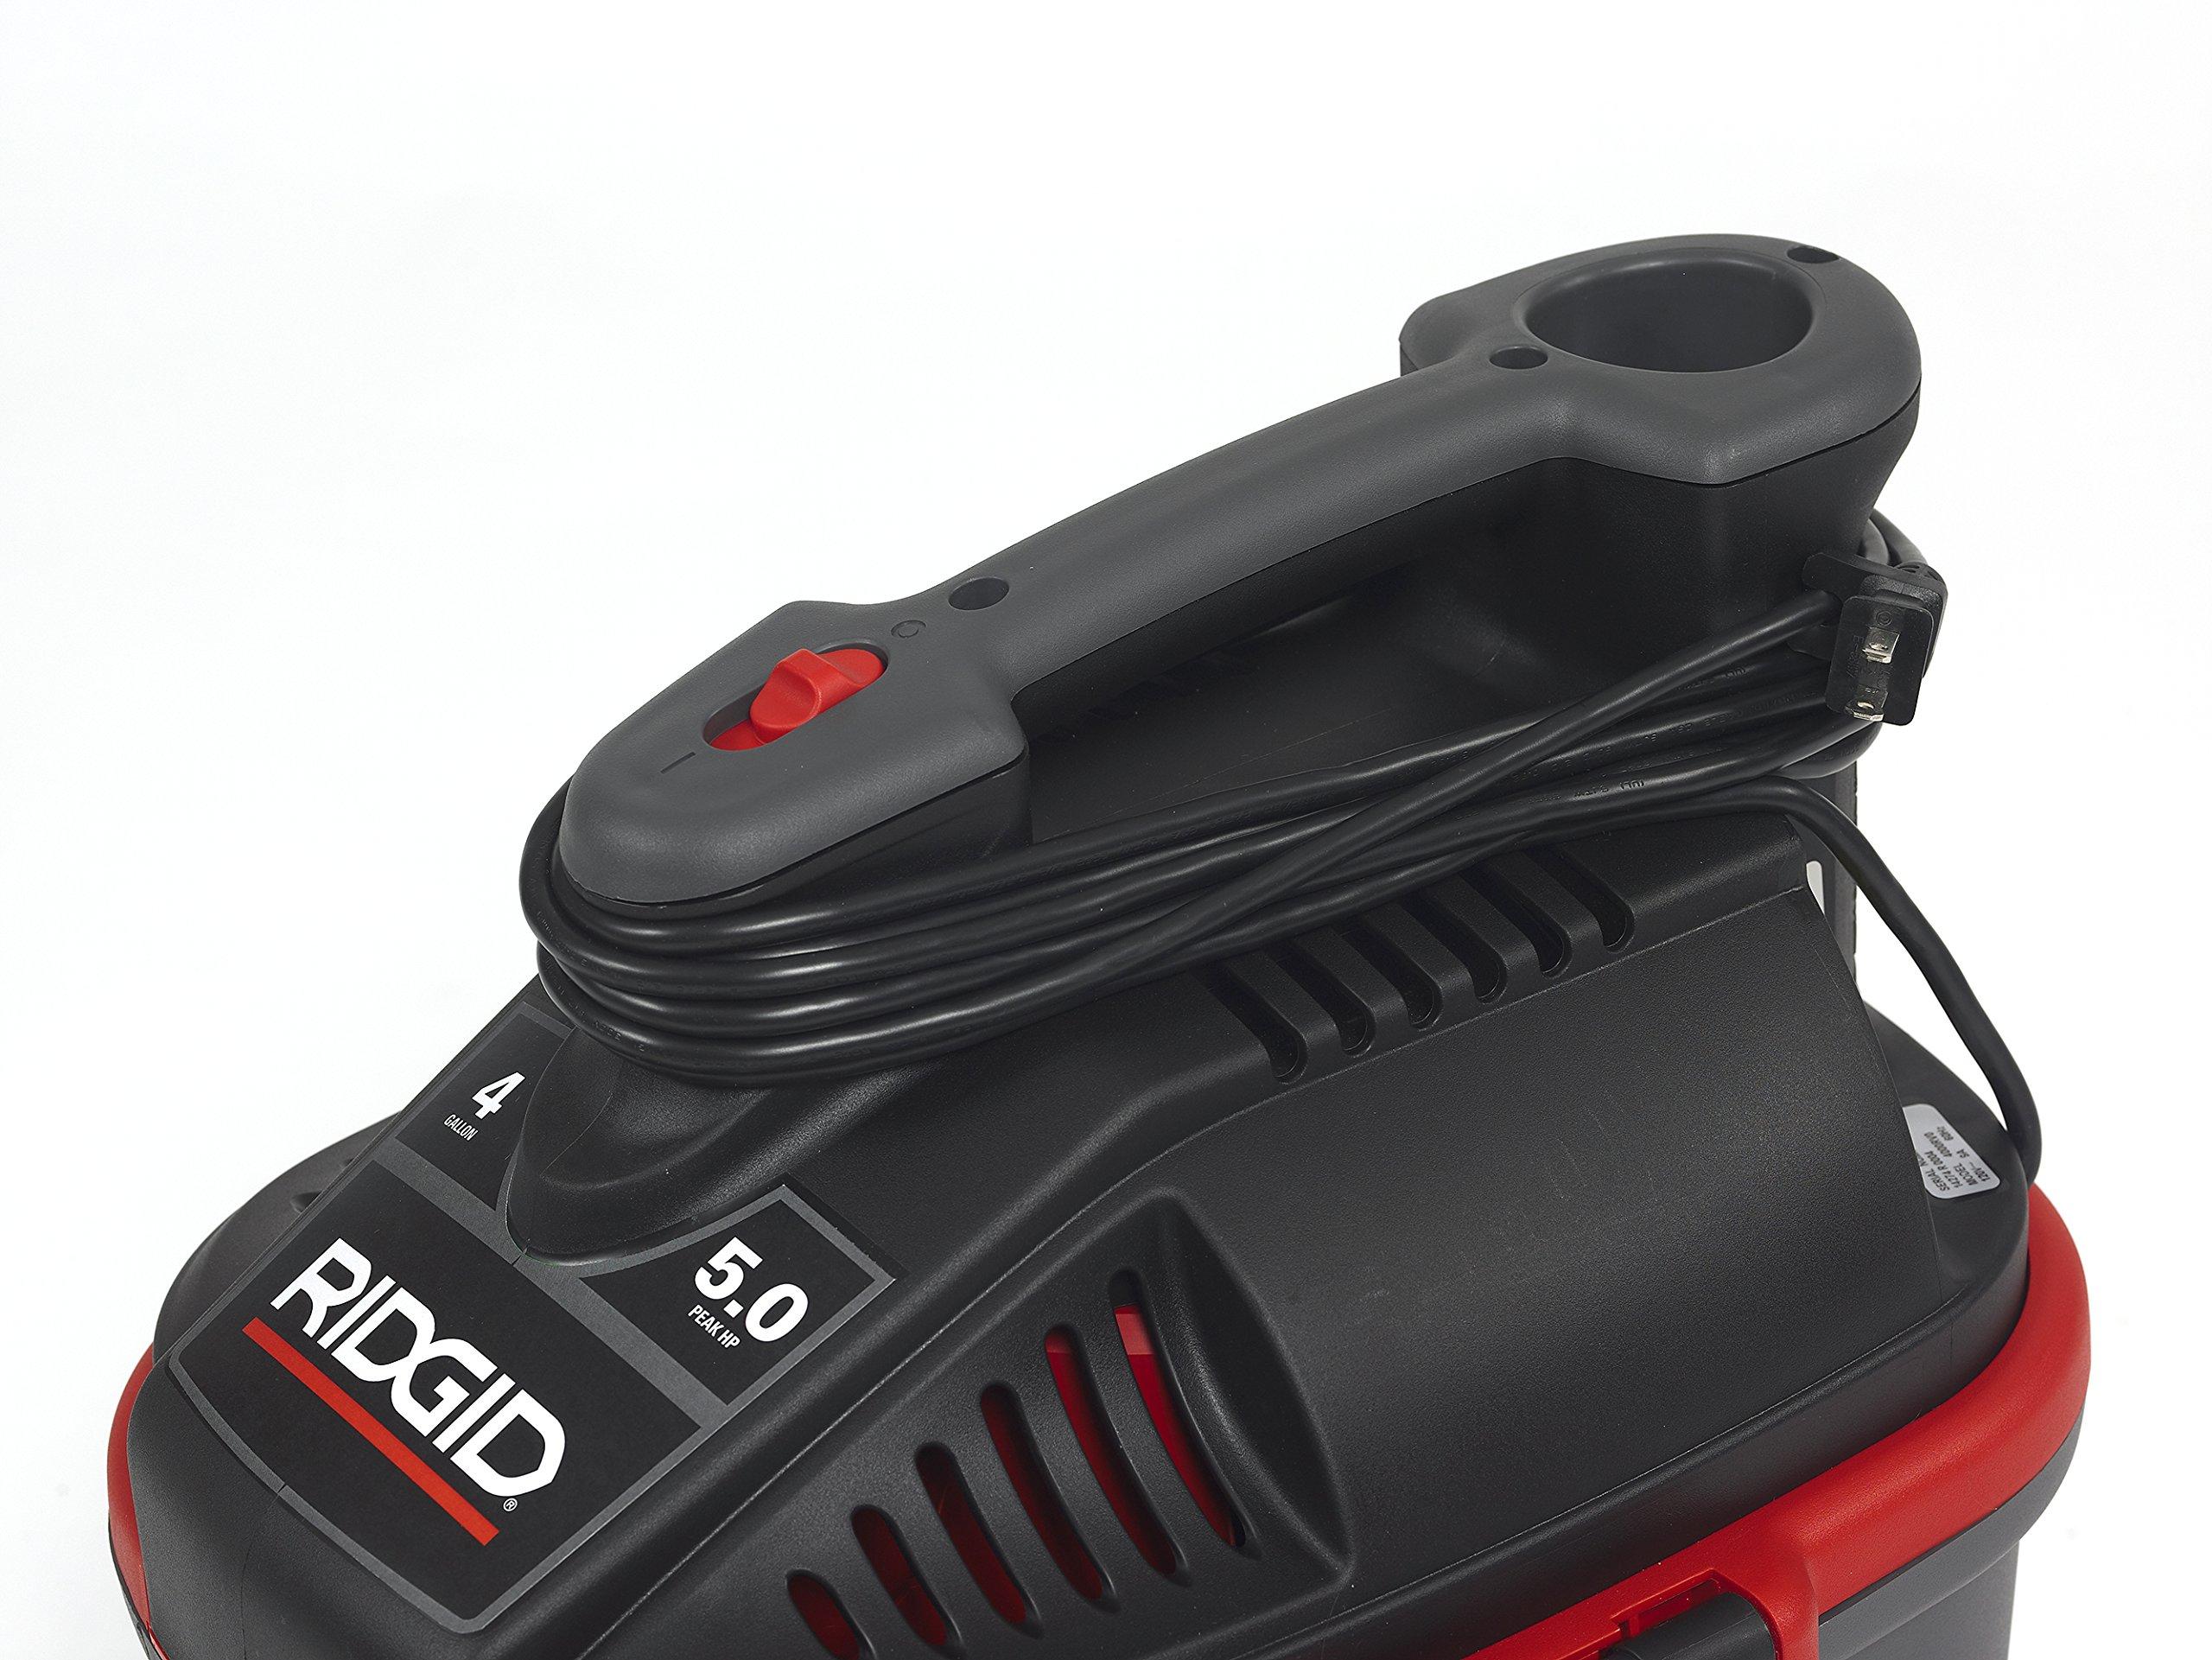 RIDGID 50313 4000RV Portable Wet Dry Vacuum, 4-Gallon Small Wet Dry Vac with 5.0 Peak HP Motor, Pro Hose, Ergonomic Handle, Cord Wrap, Blower Port by Ridgid (Image #7)